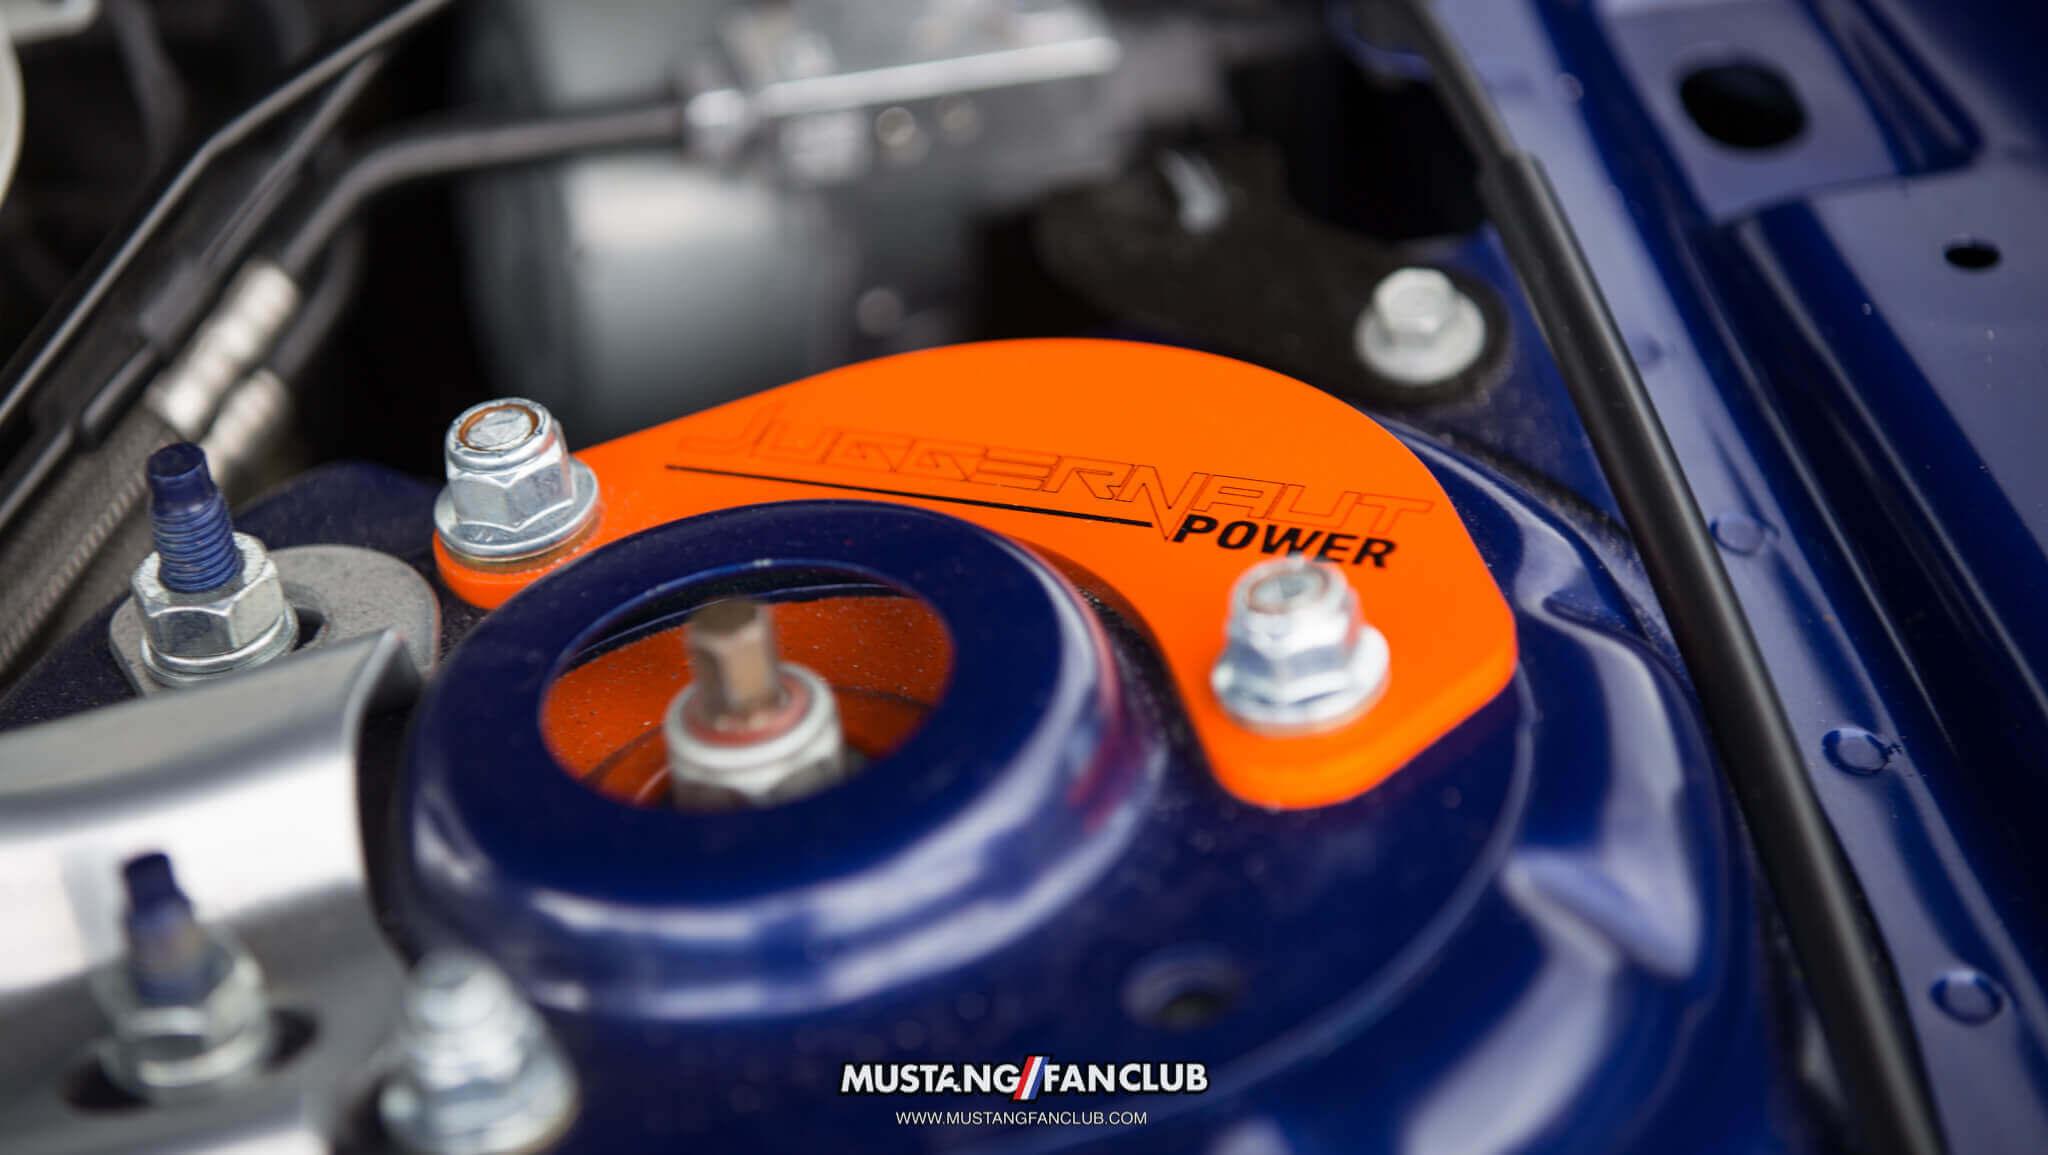 deep impact blue s550 mustang fan club roush performance front fascia camo wrap upr products steve gelles mustang week 2016 16' juggernaut power